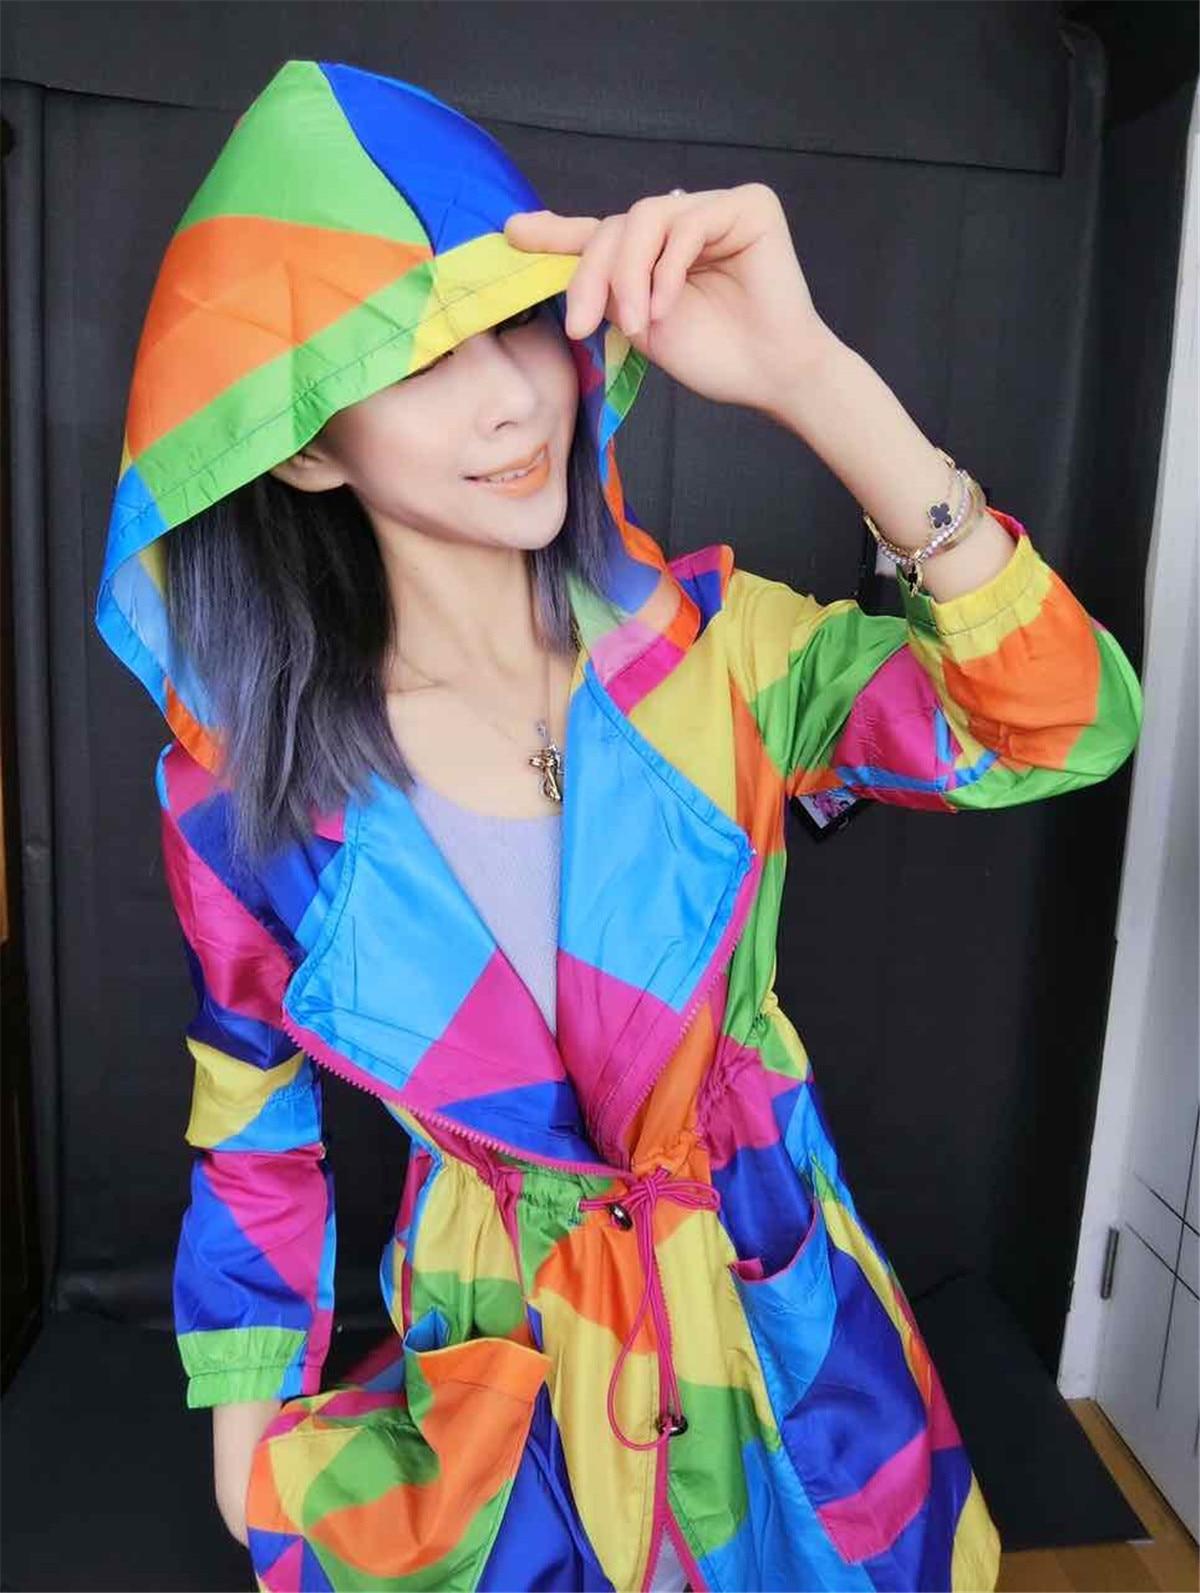 colorful sun-proof women   trench   coat 2019 autumn new hooded zipper loose female elegant outwear cardigan tops plus size 2XL 3XL